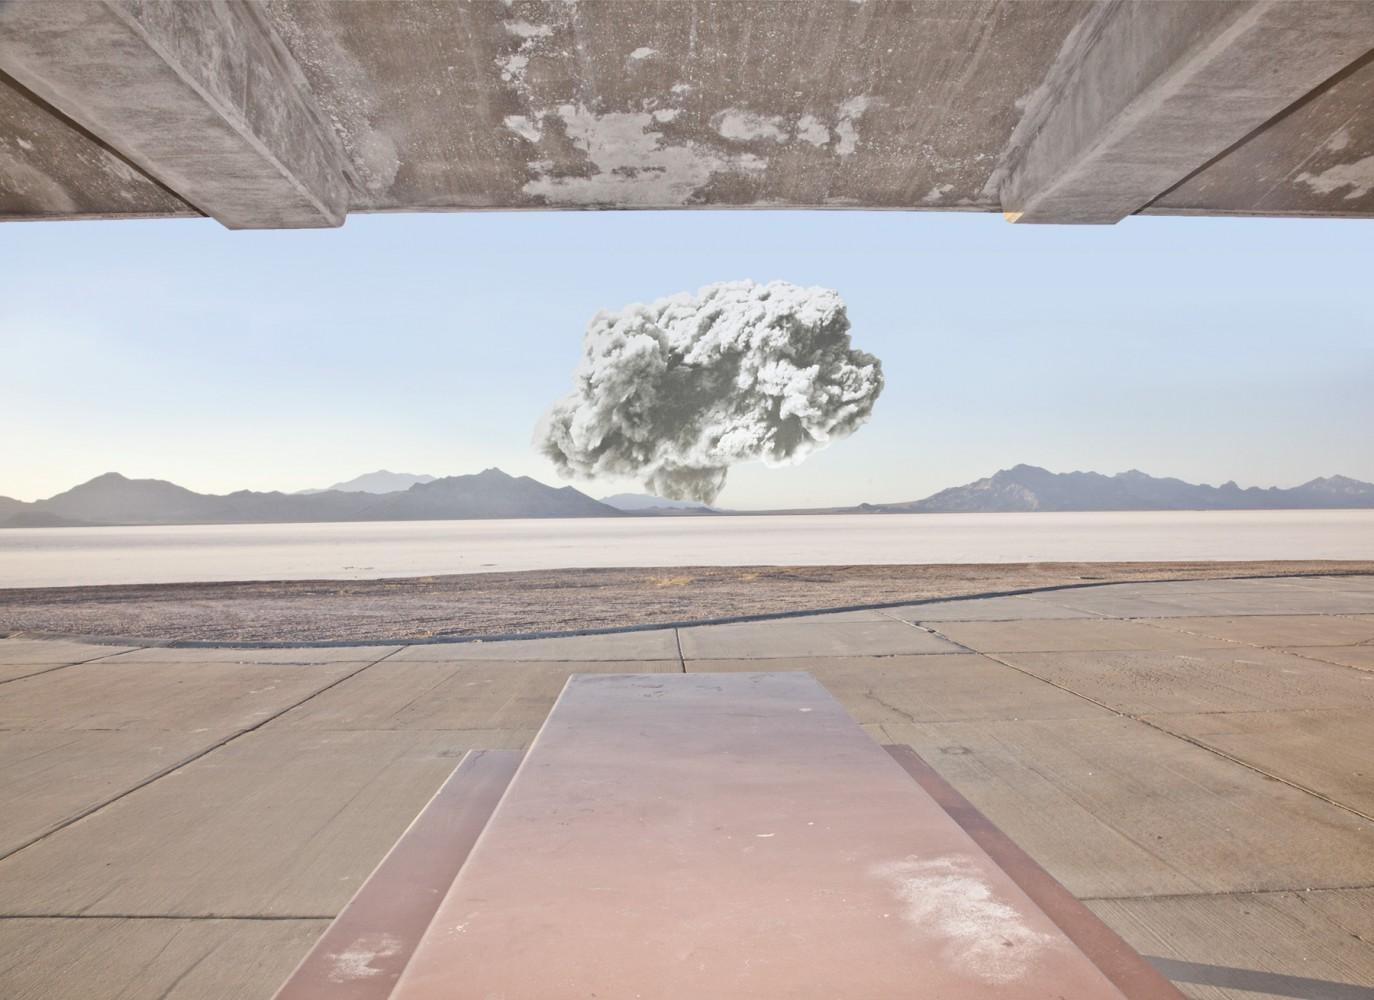 <Marco Walker> <Bonneville> <Art is Our Escape> <Darklight Art>